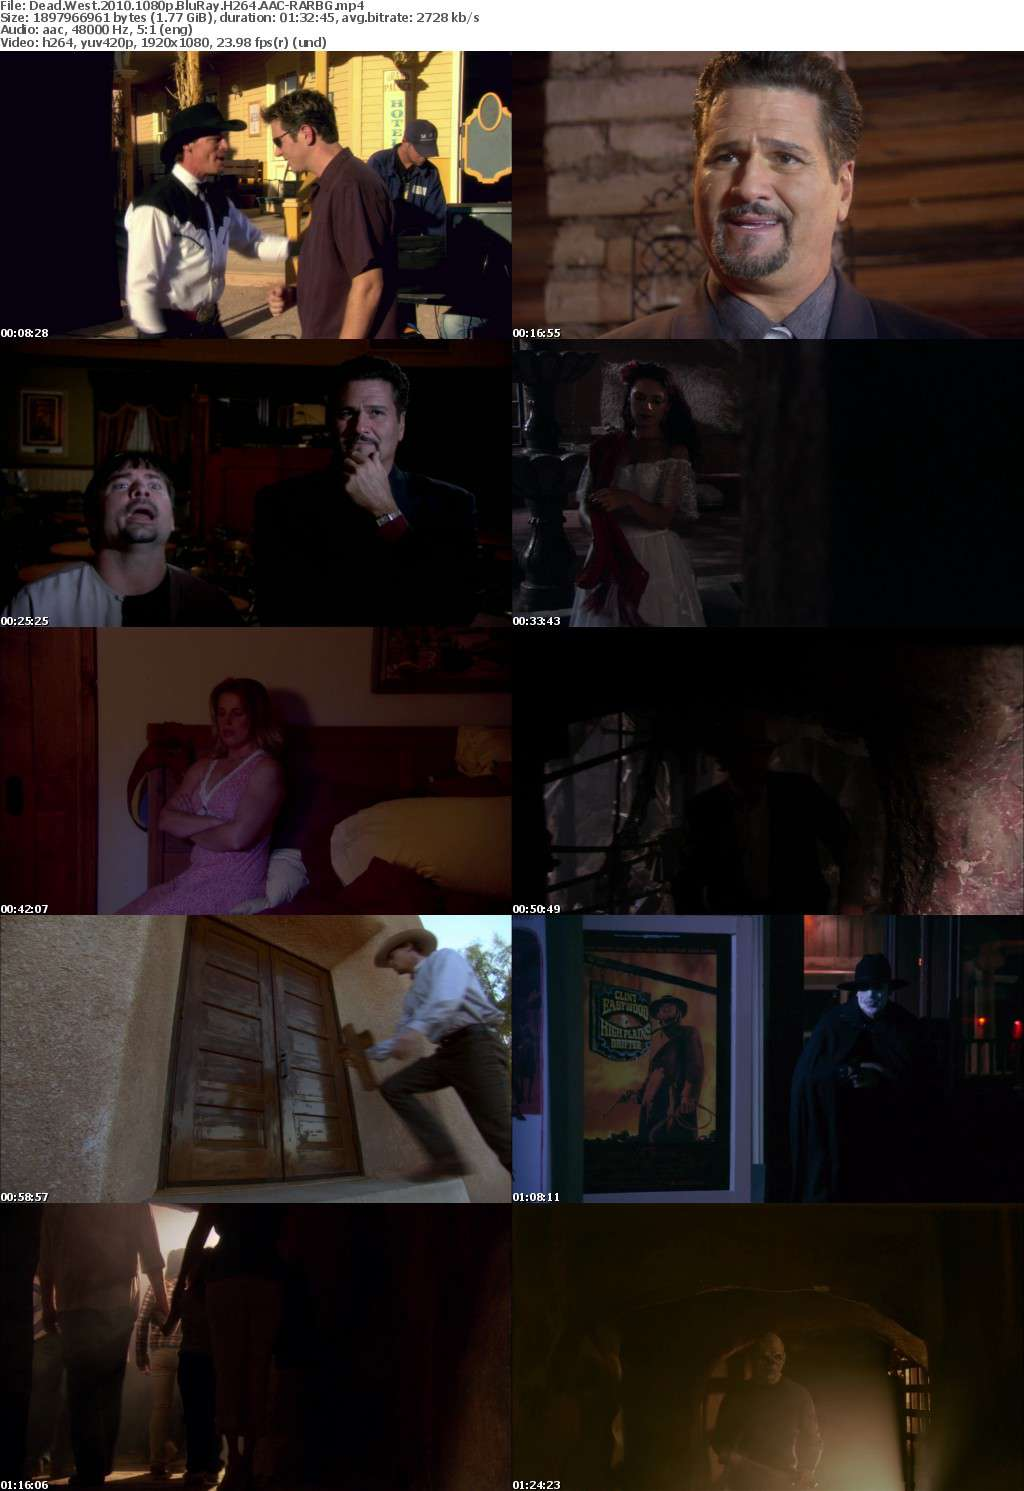 Dead West 2010 1080p BluRay H264 AAC-RARBG